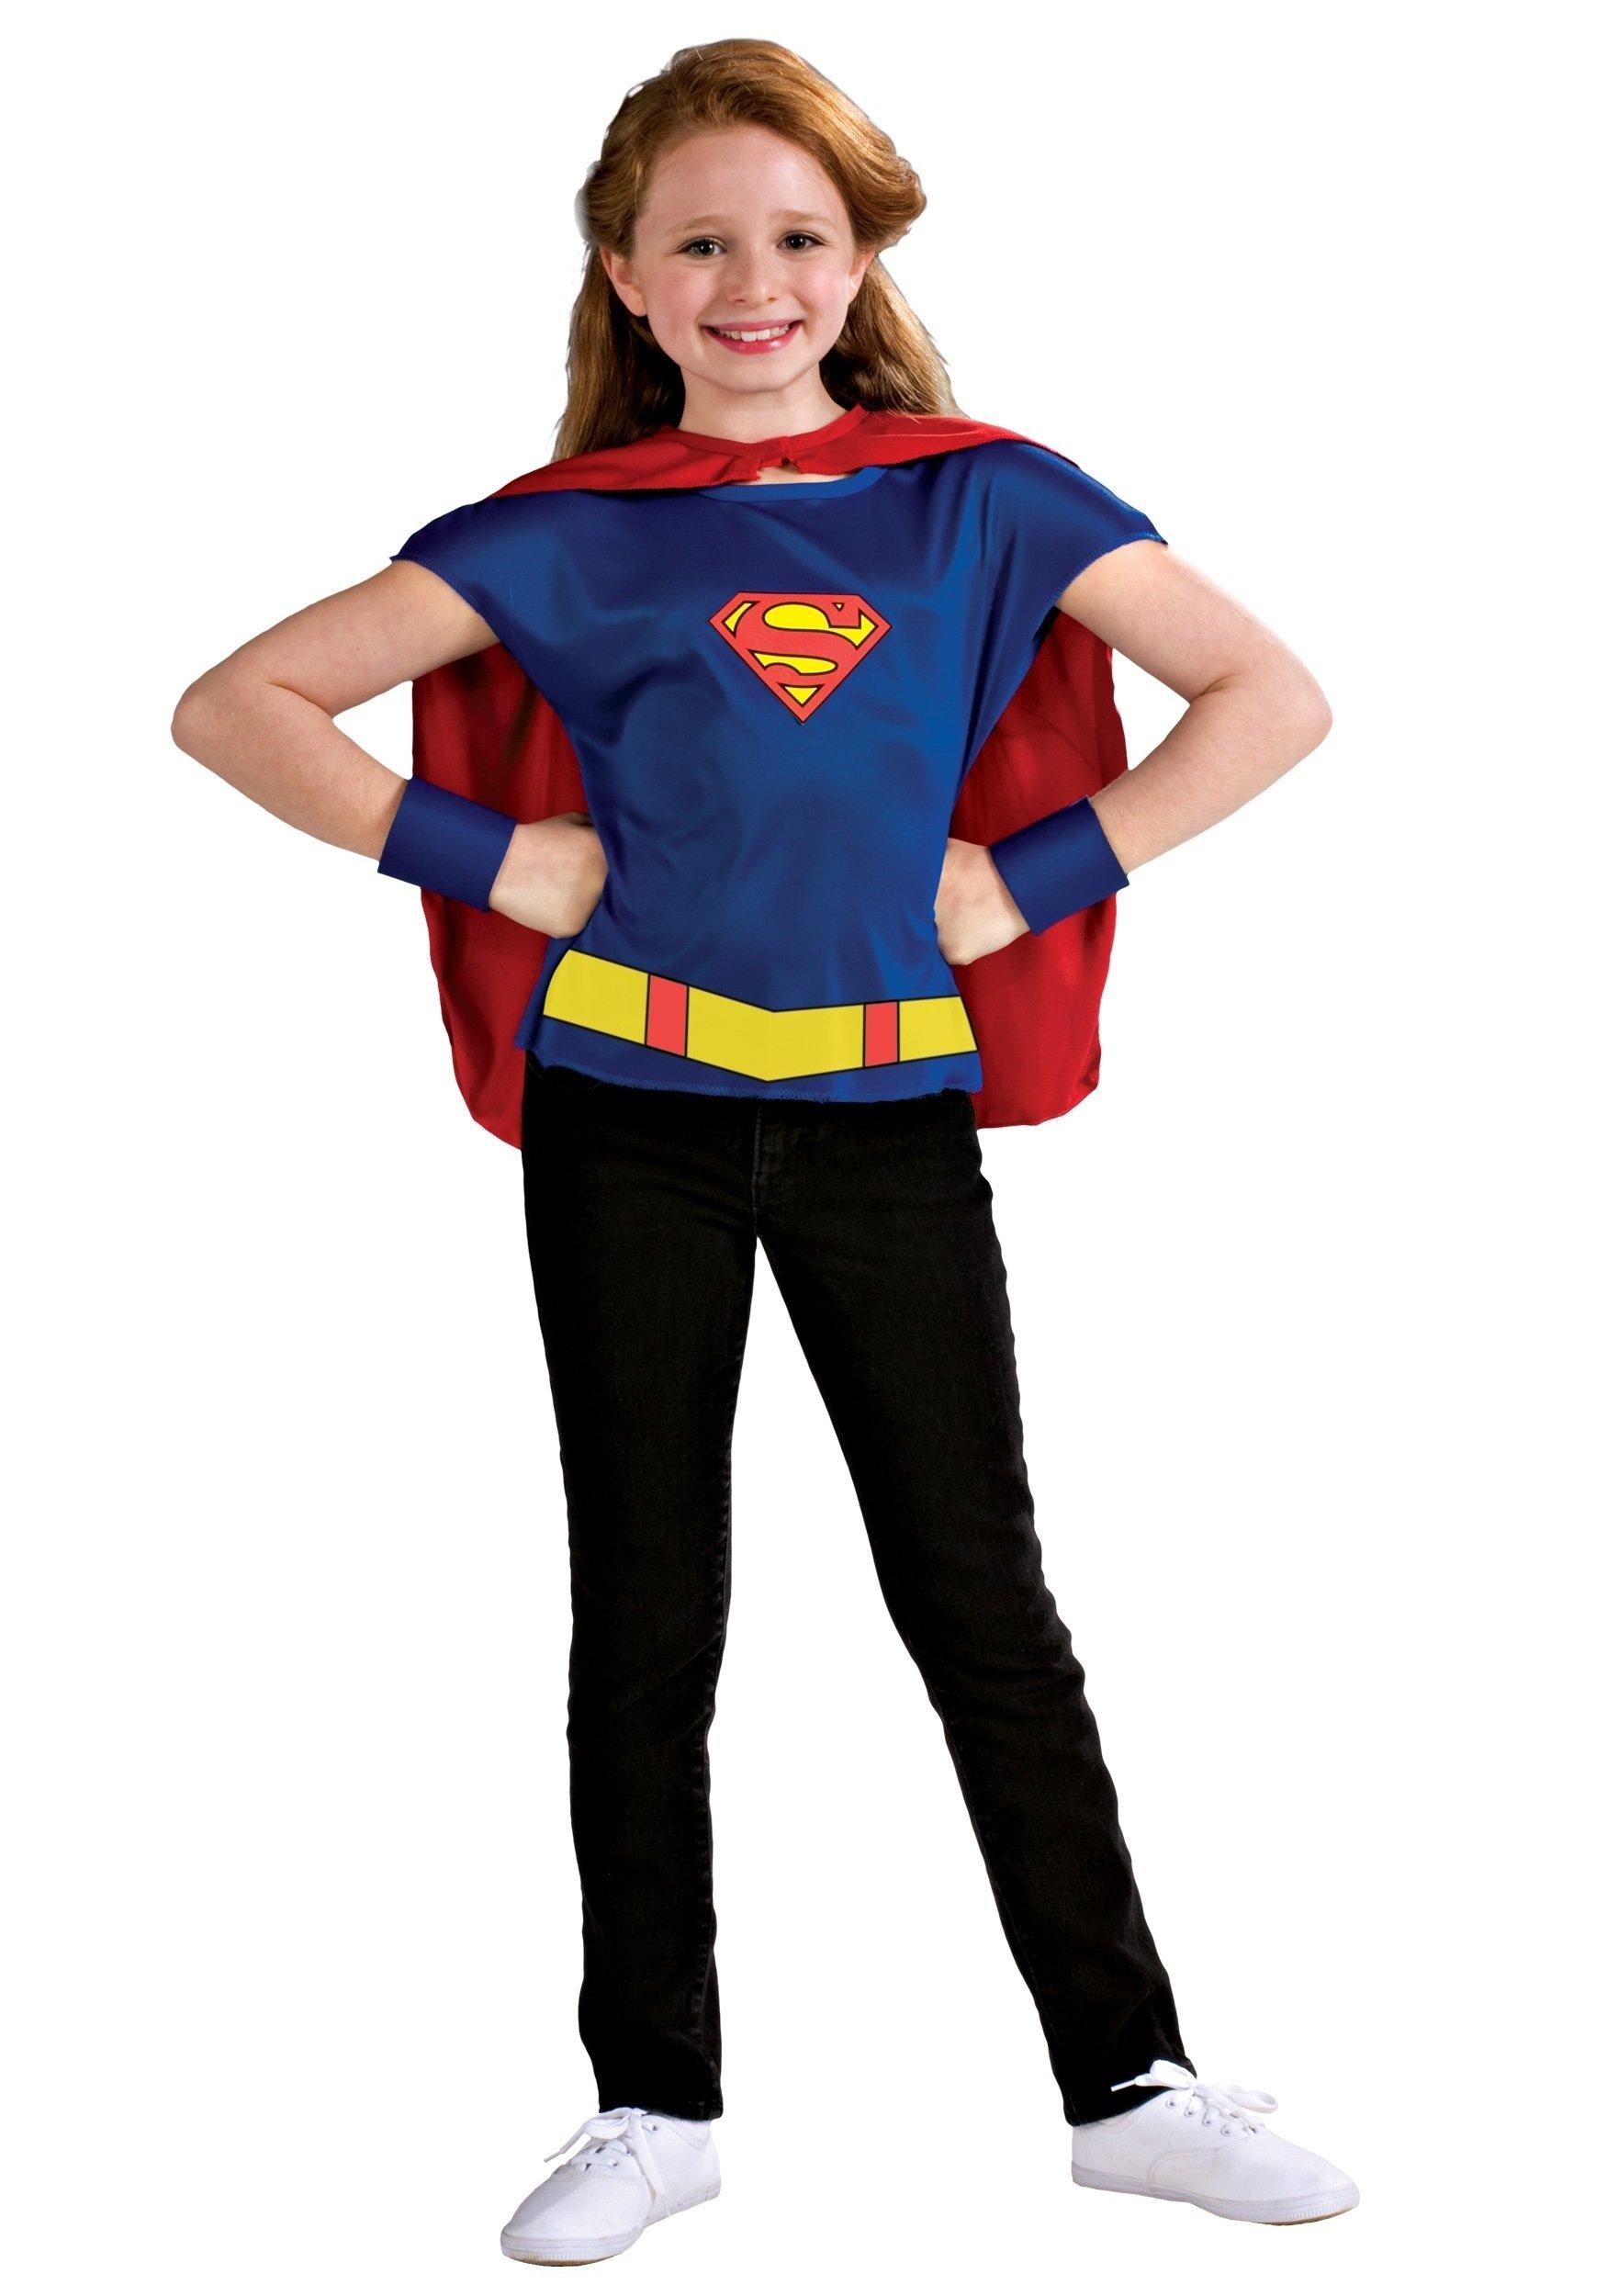 10 Fashionable Made Up Superhero Costume Ideas supergirl costume set halloween costume ideas 2016 2020